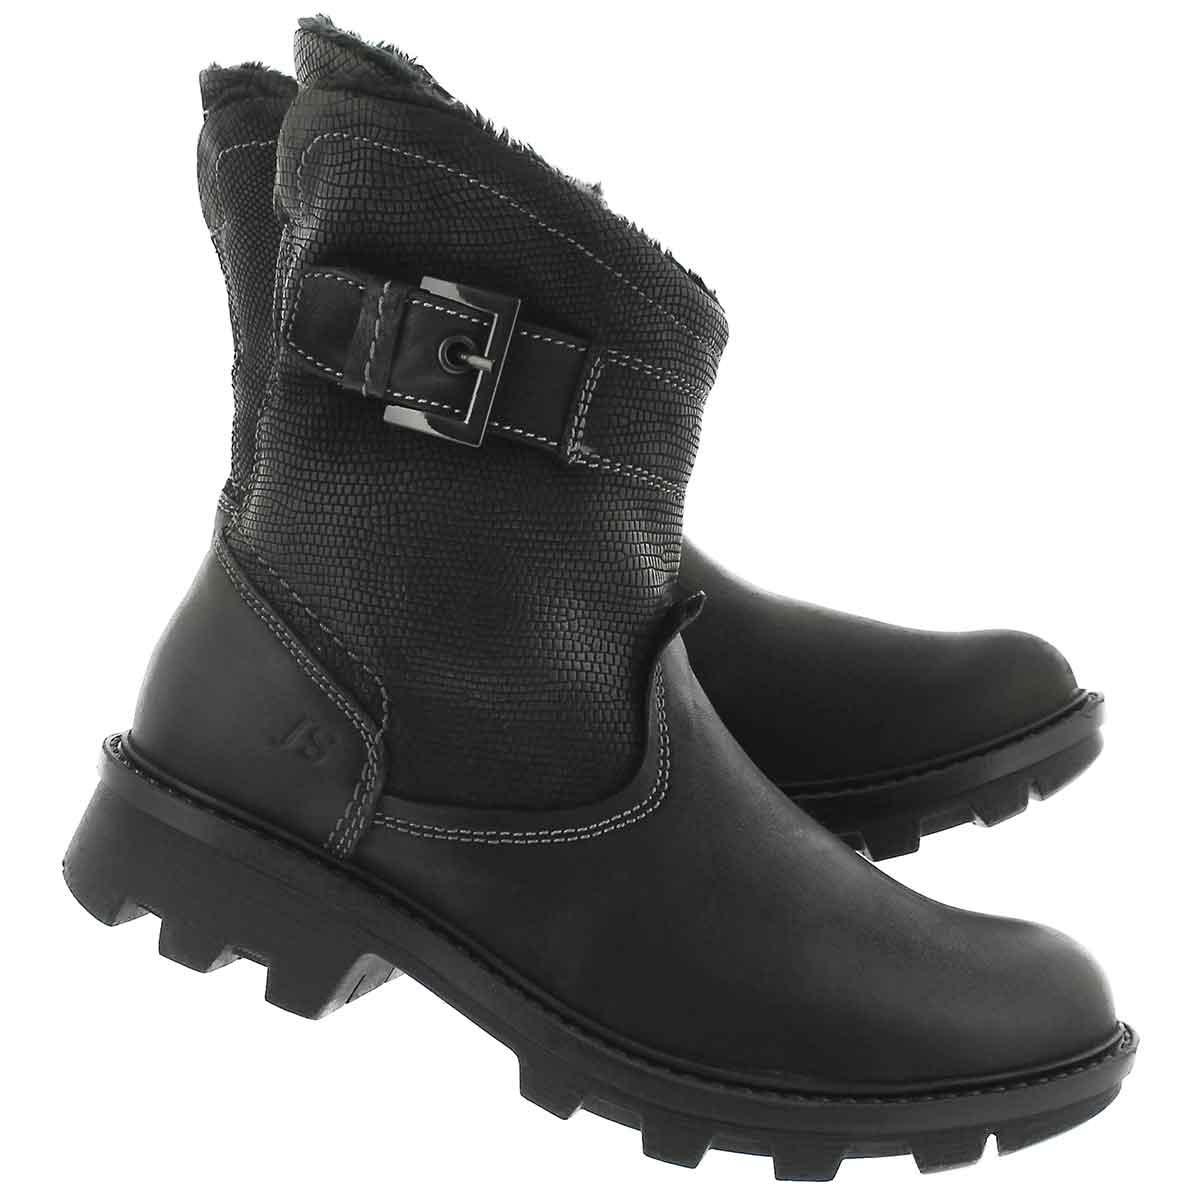 Lds Marilyn09 schwarz short midcalf boot